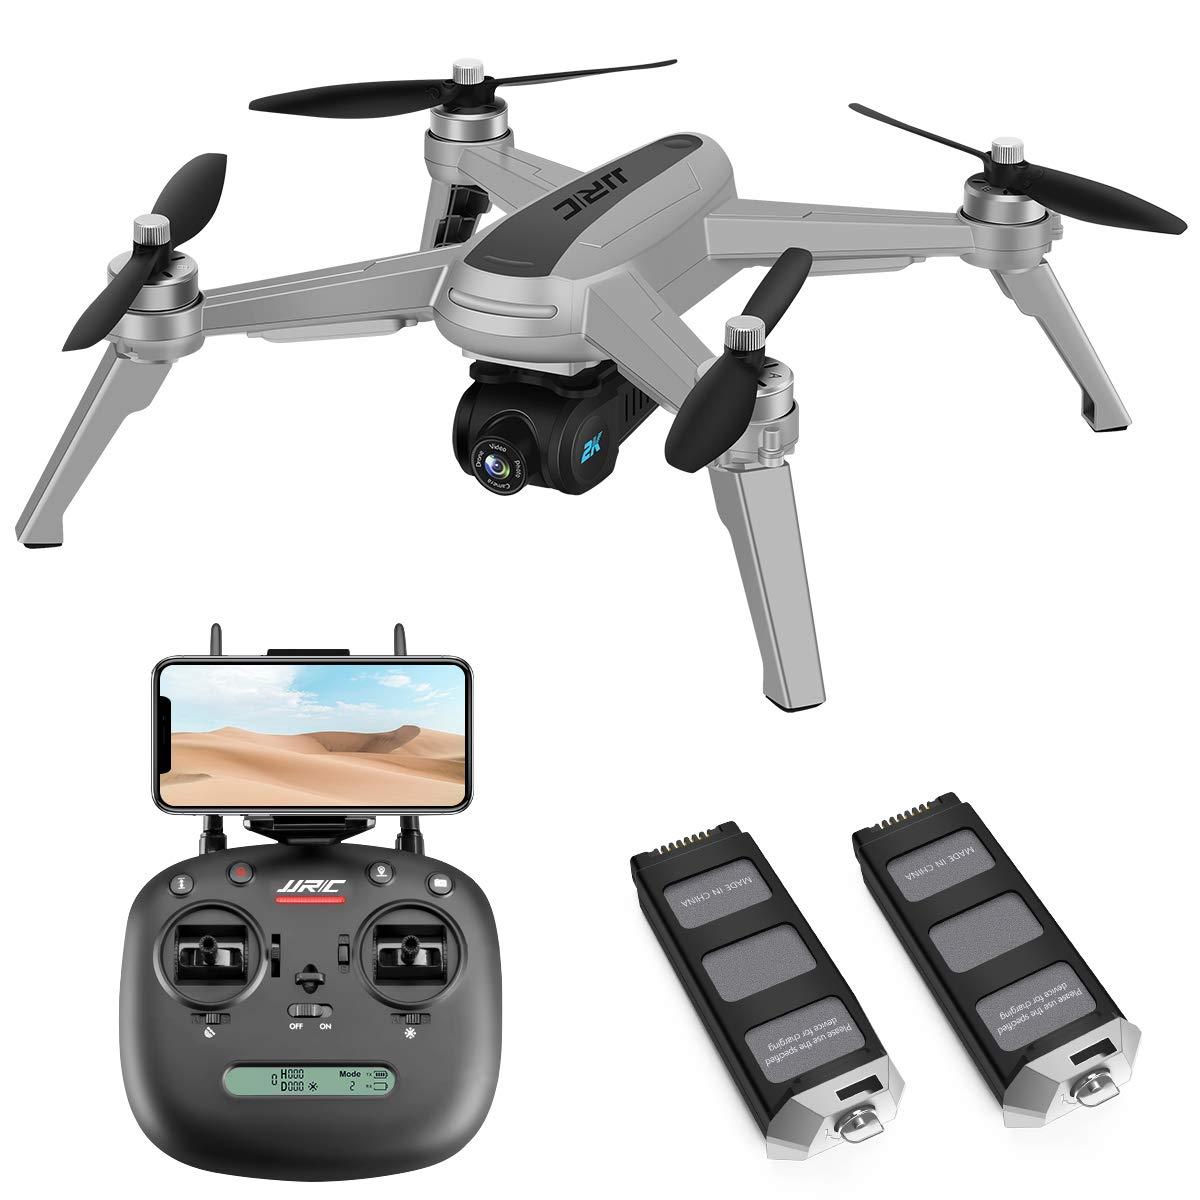 JJRC Quadcopter Brushless 90%C2%B0Adjustable Camera Follow